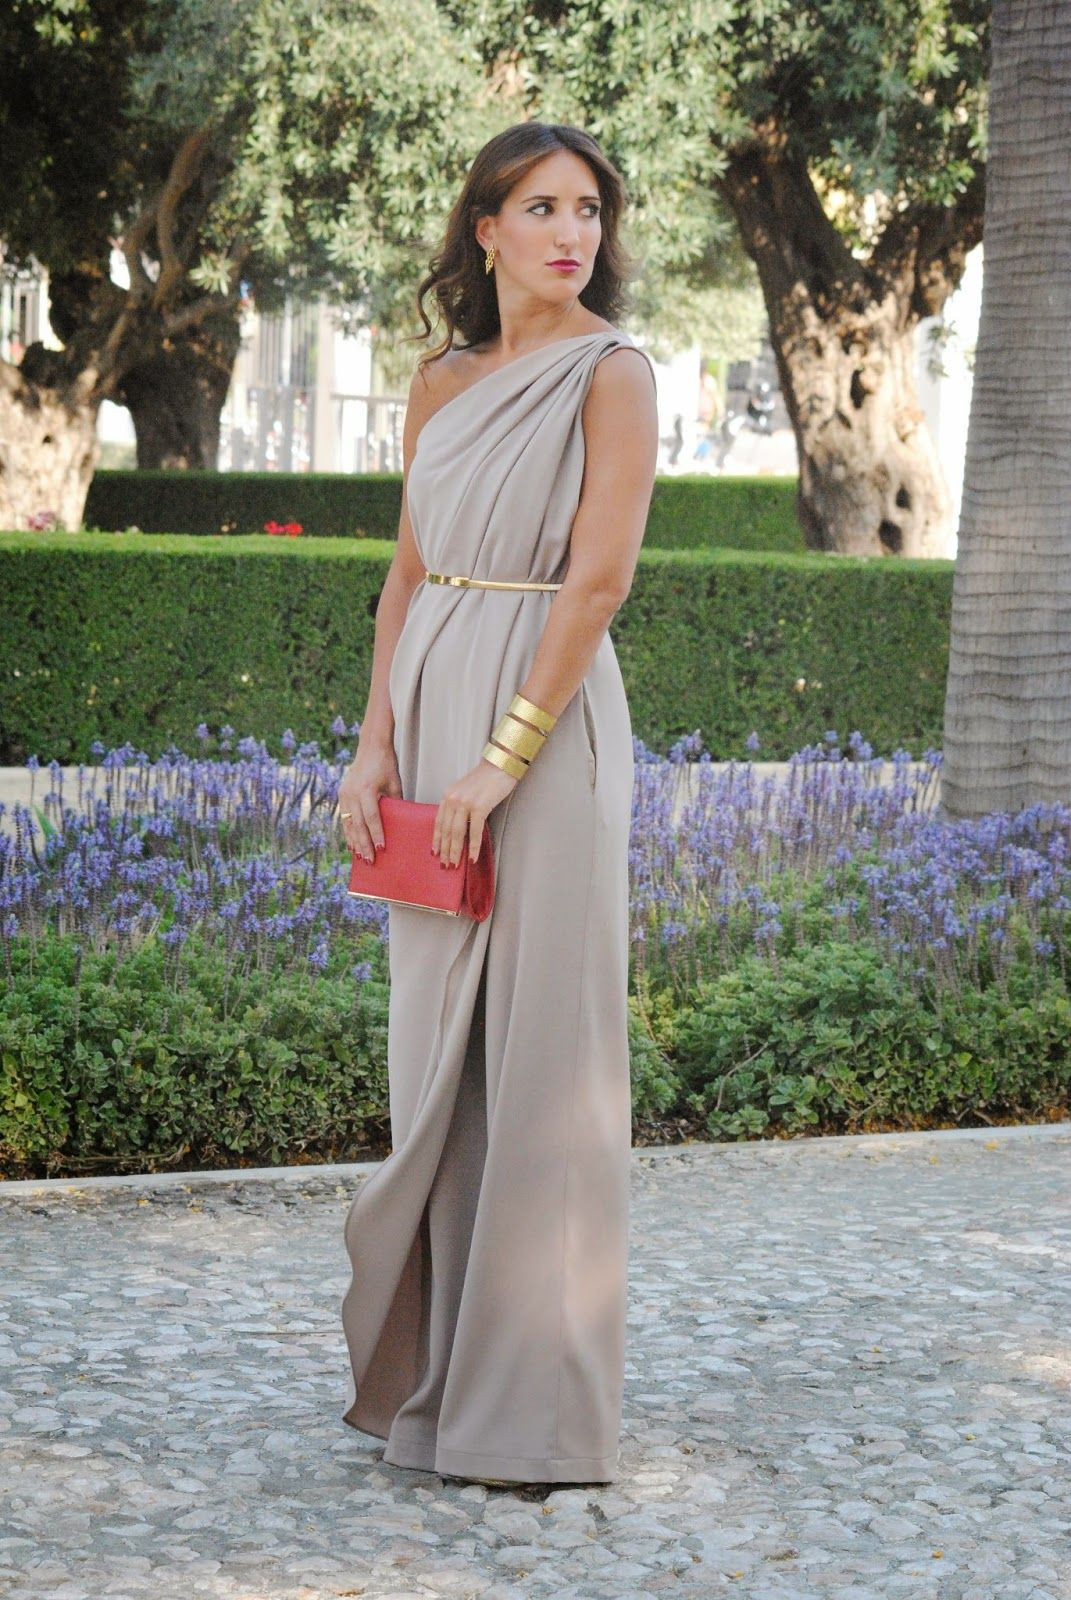 Invitadas #weddingguest #fashionsouth. AntonioGarcia   Siempre ...